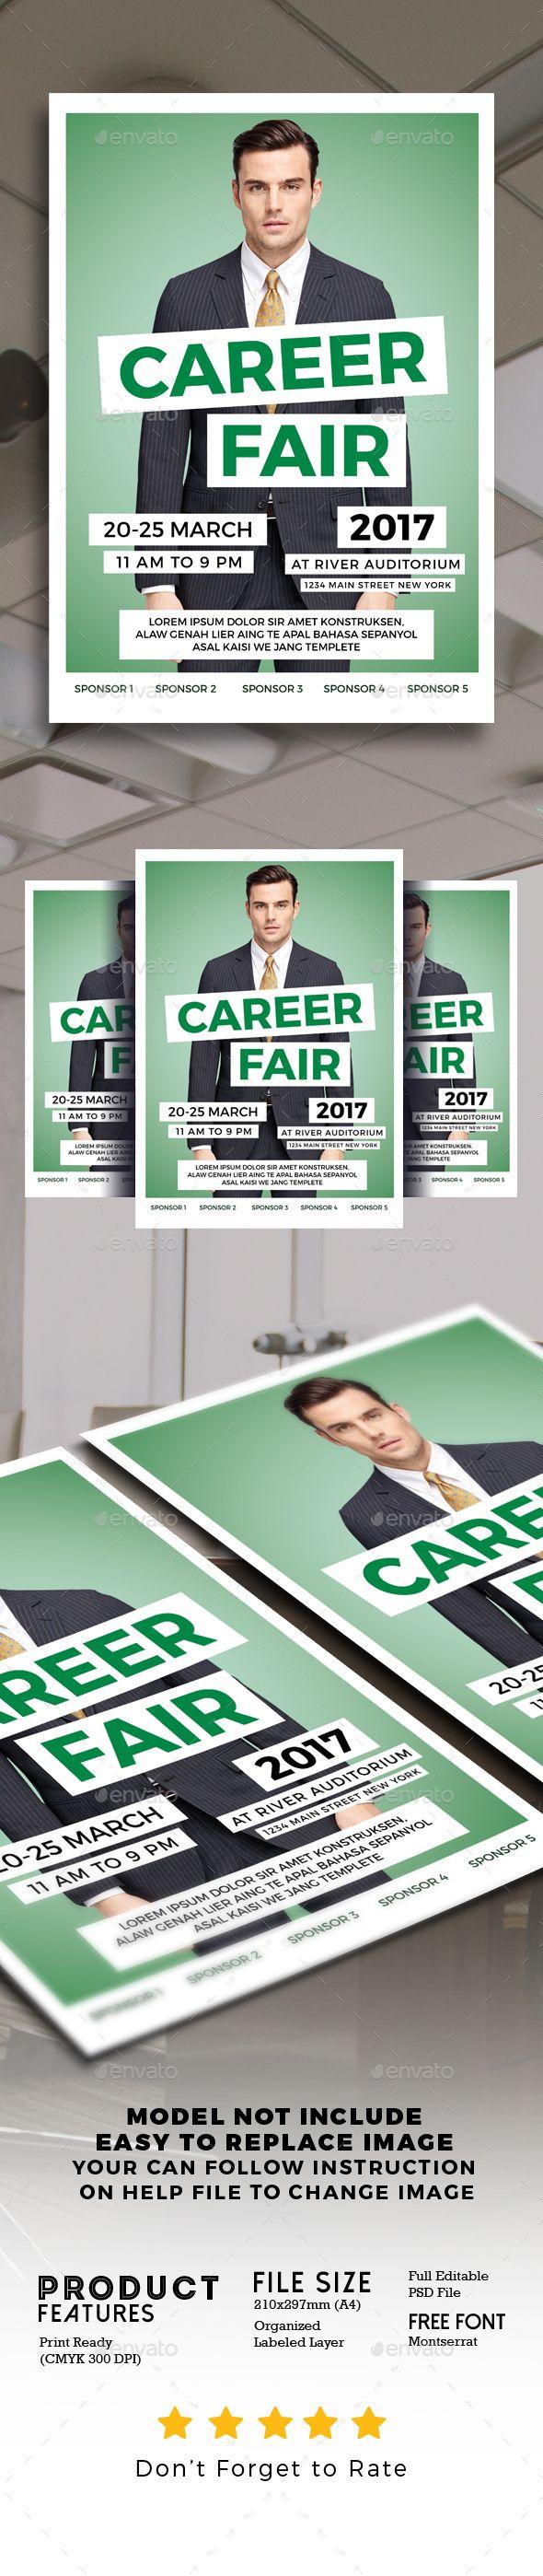 Career Fair Flyer Corporate invitation design, Flyer